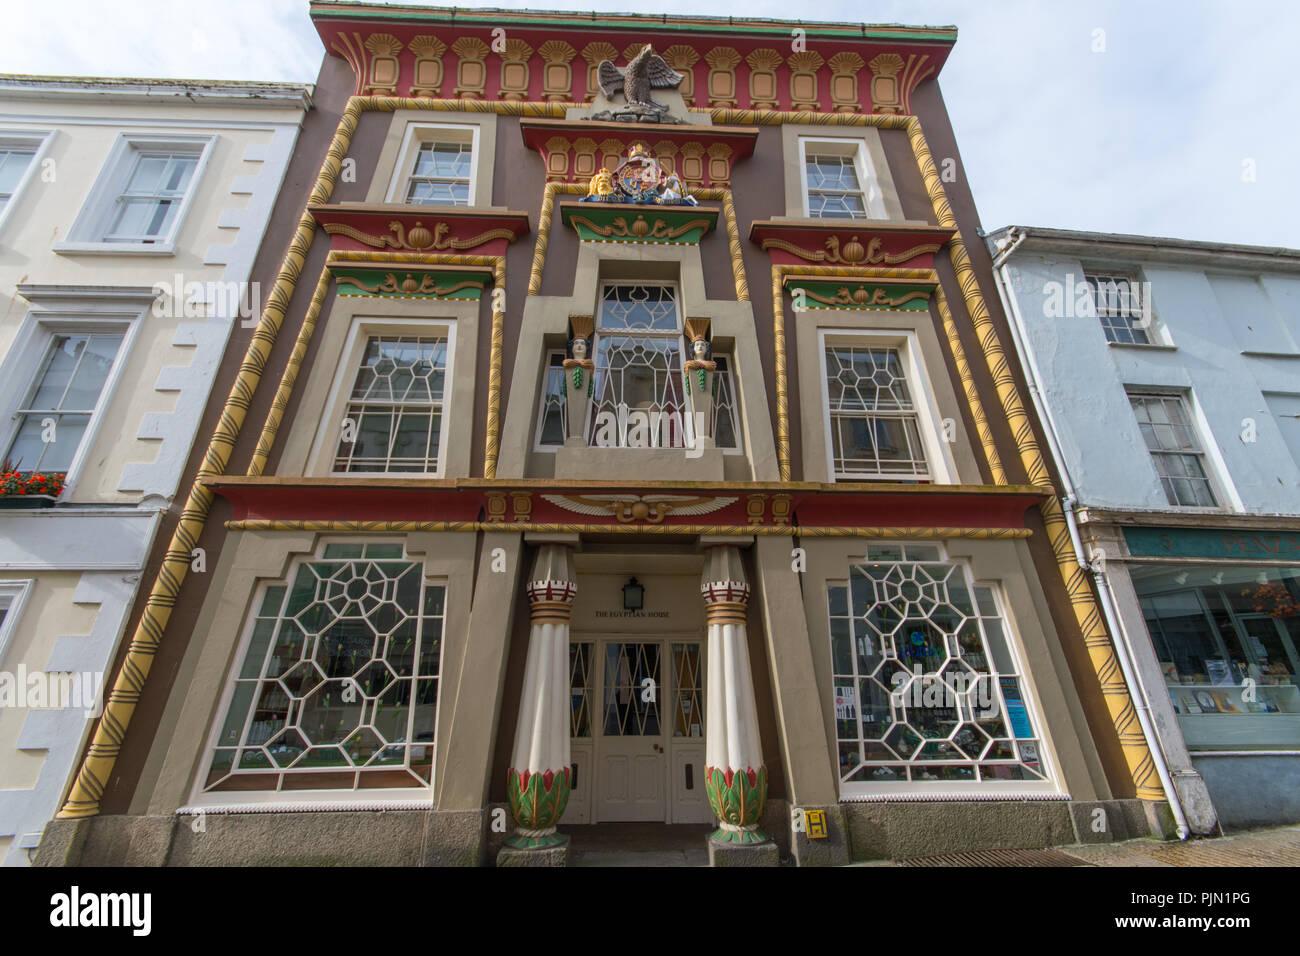 The Egyptian House on Chapel Street Penzance - Stock Image